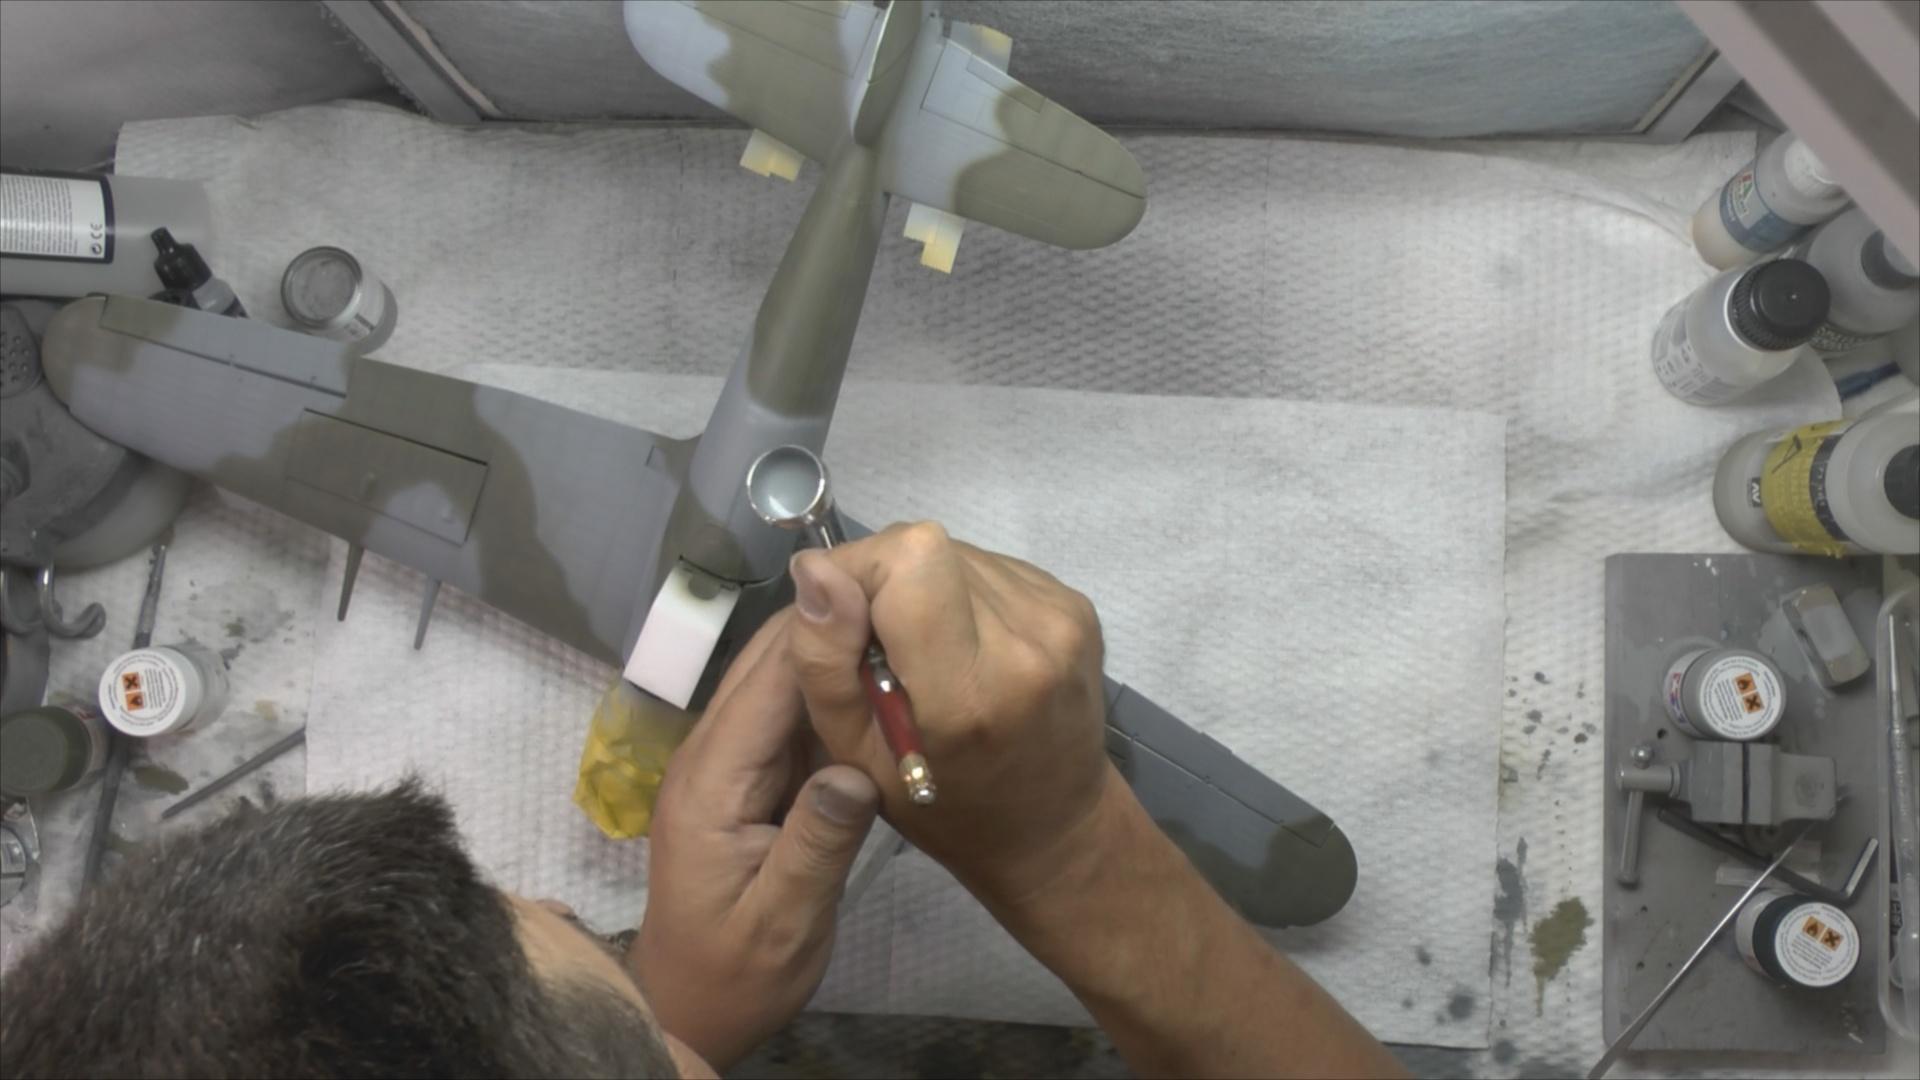 Hawker+Typhoon+Part+9+Pic+1.jpg